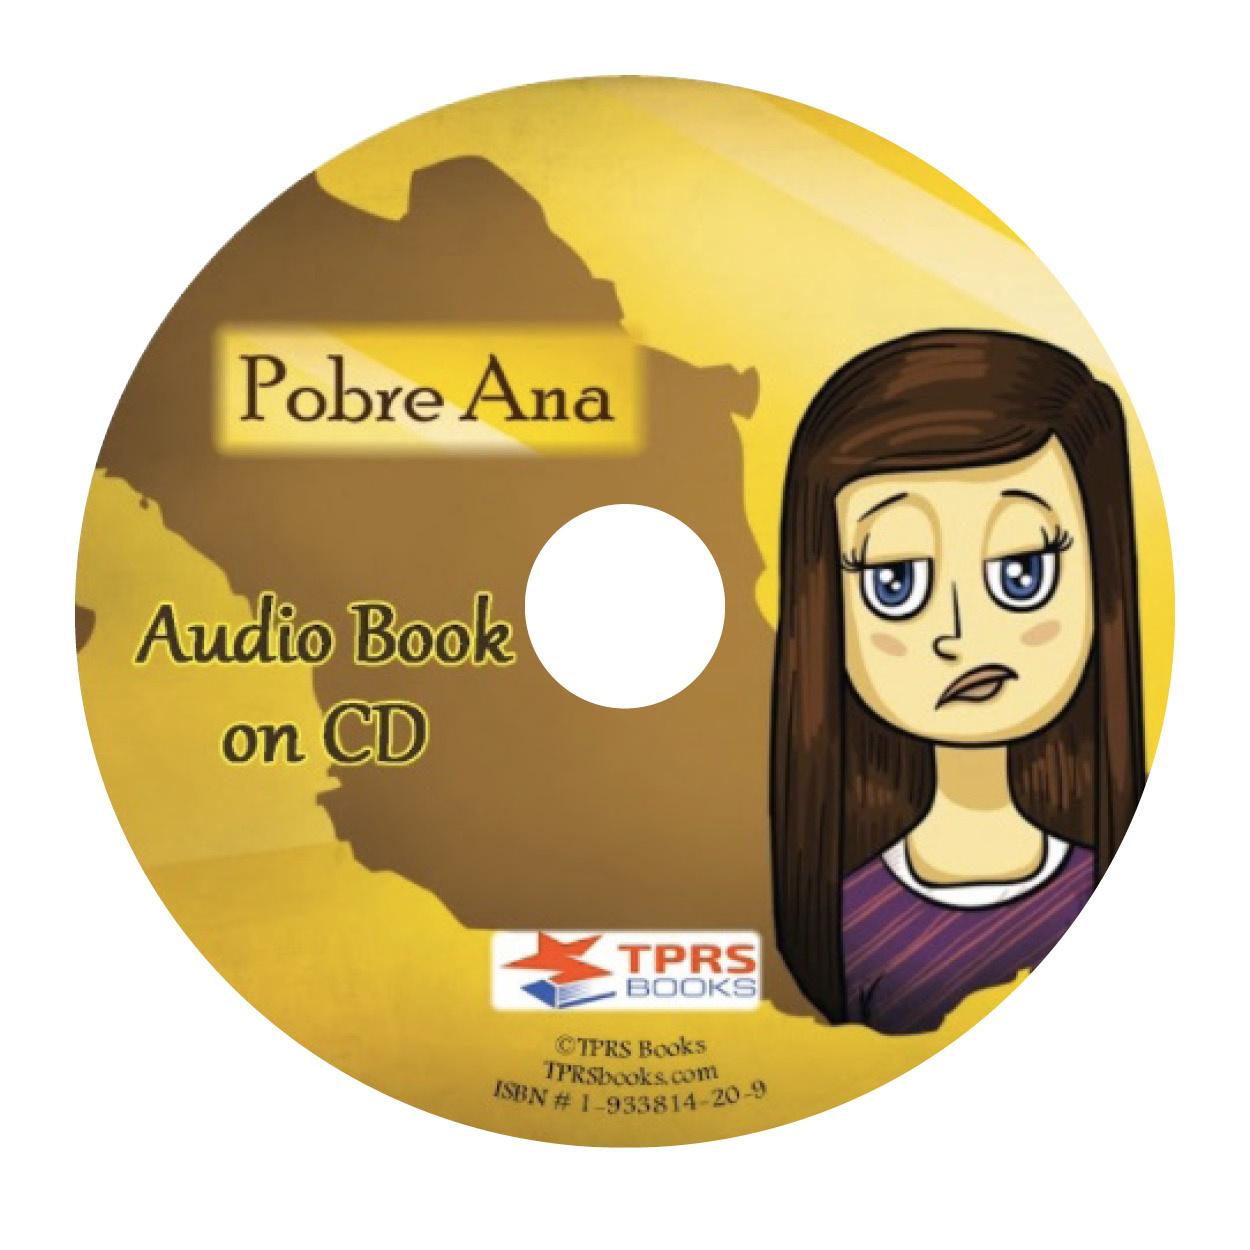 Pobre Ana - Audiobook